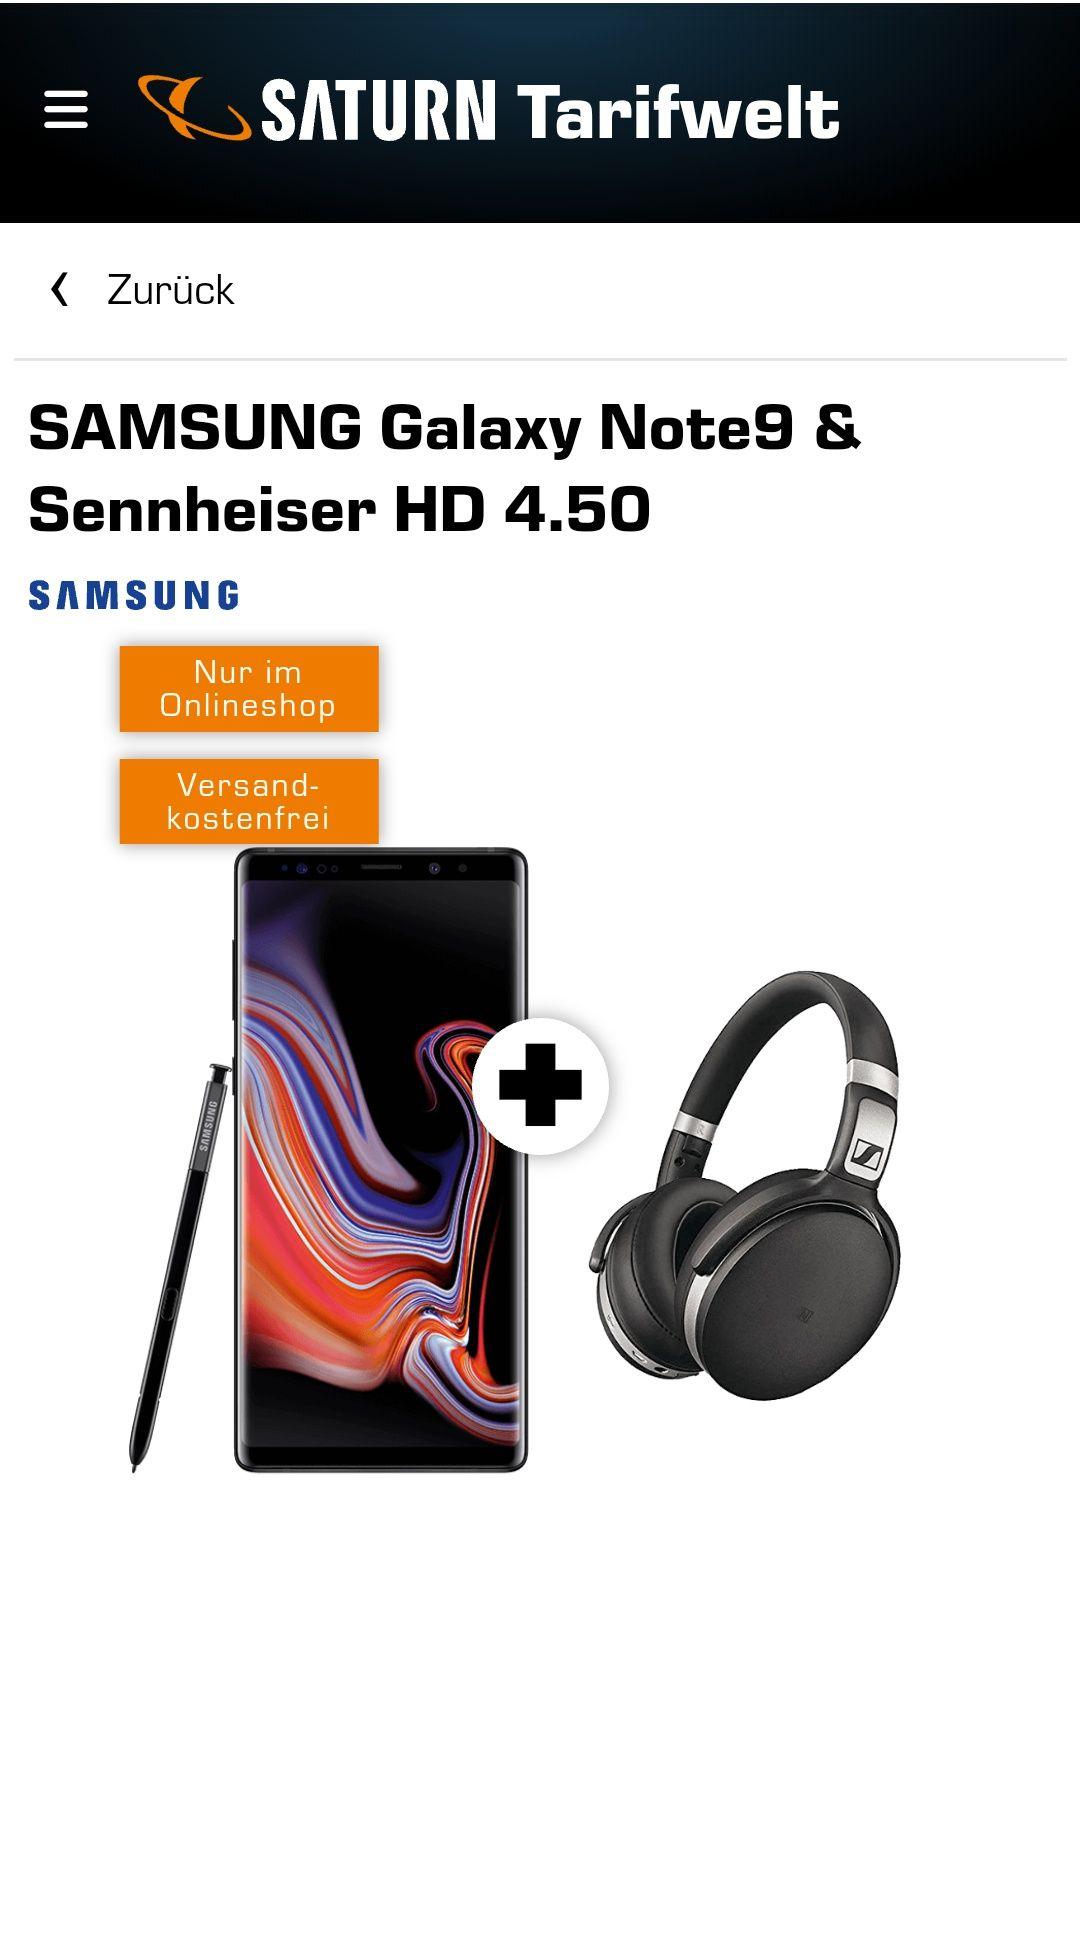 Samsung Galaxy Note 9 inkl. Sennheiser HD 4.50 - Vodafone - Mobilcom Debitel - Saturn